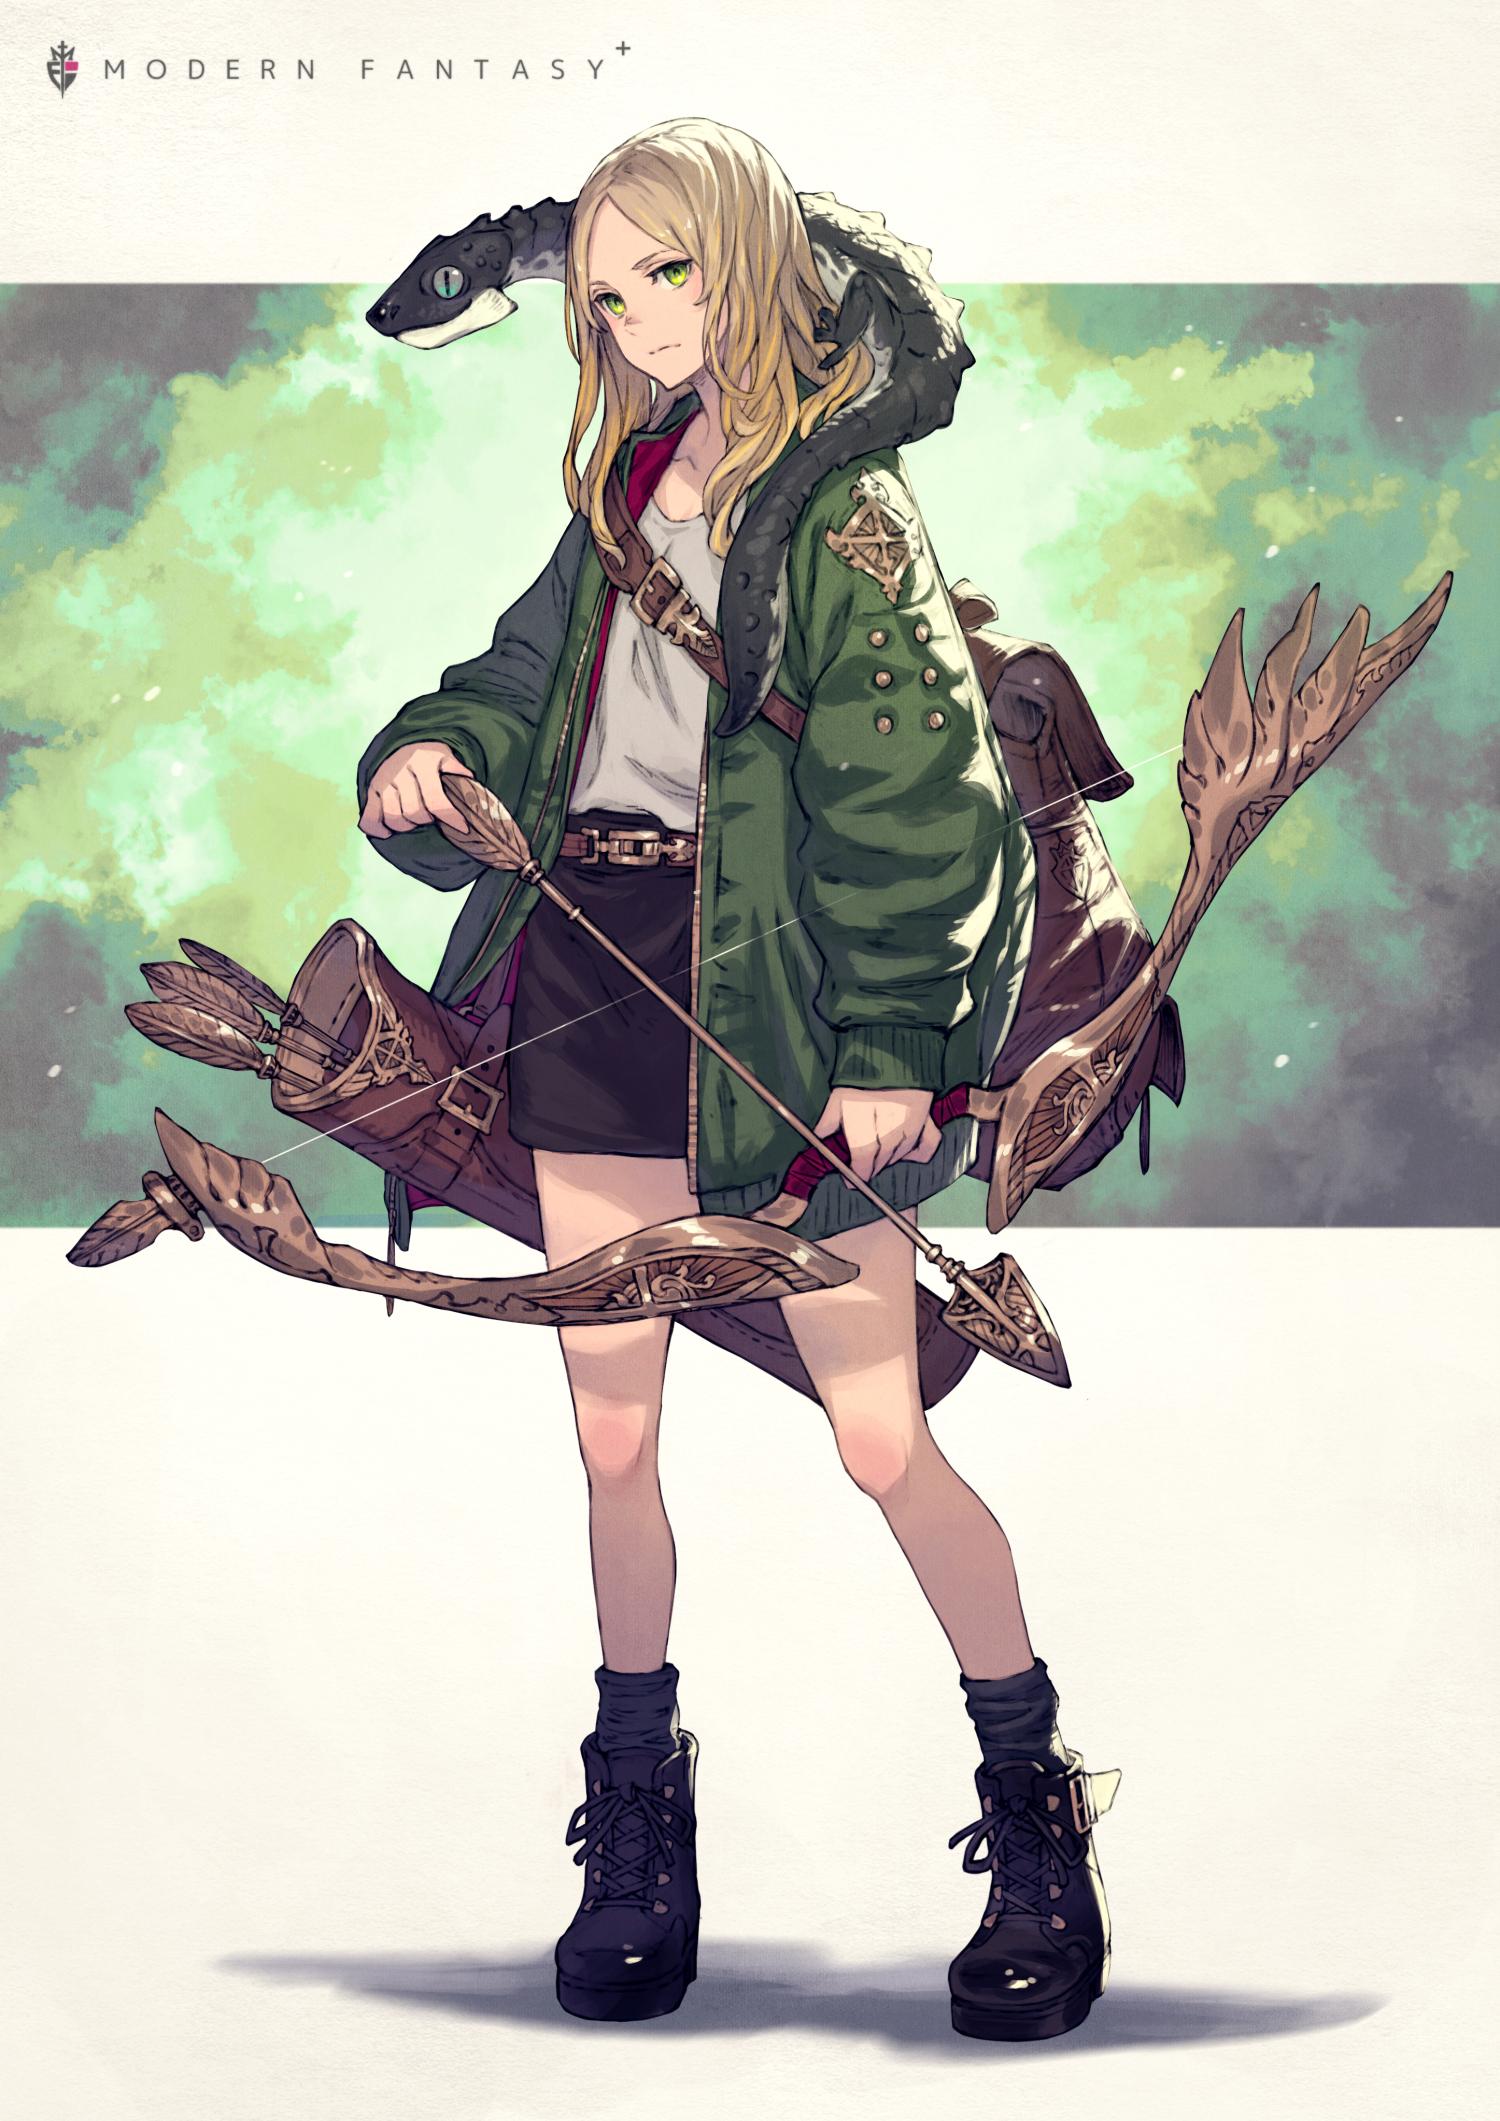 kusano shinta image 2993147  zerochan anime image board